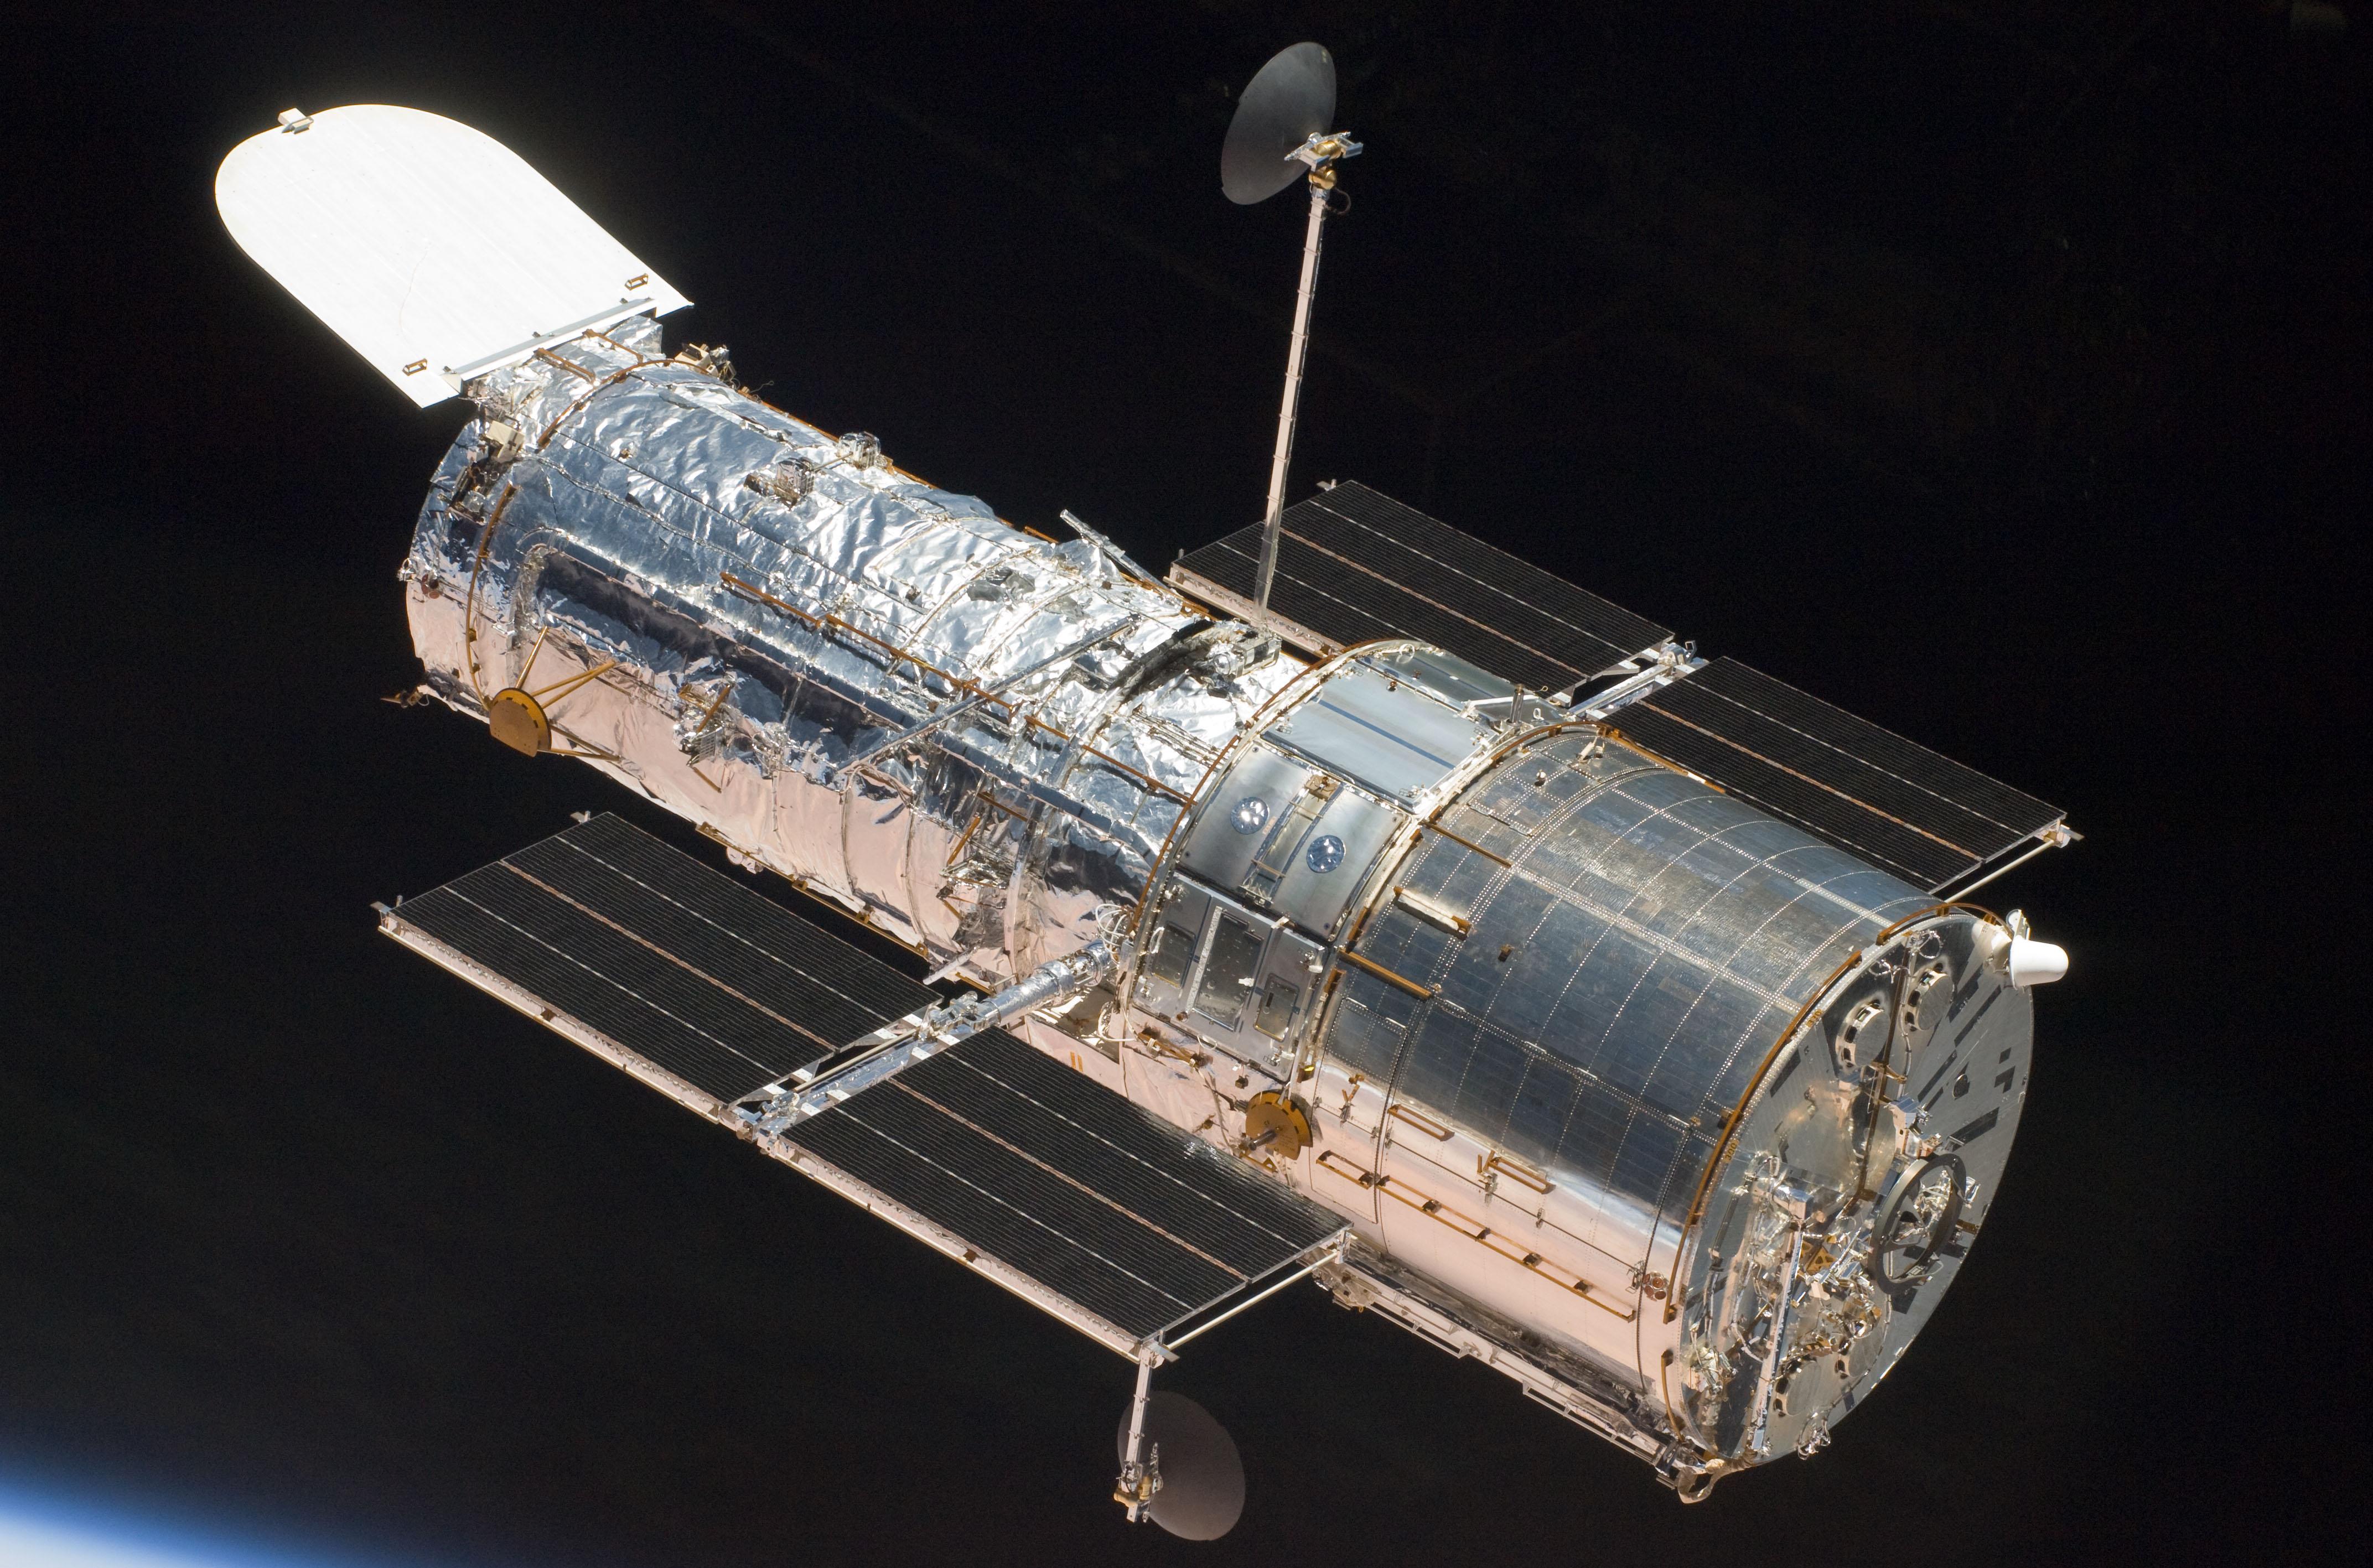 pvc model hubble space telescope - photo #26